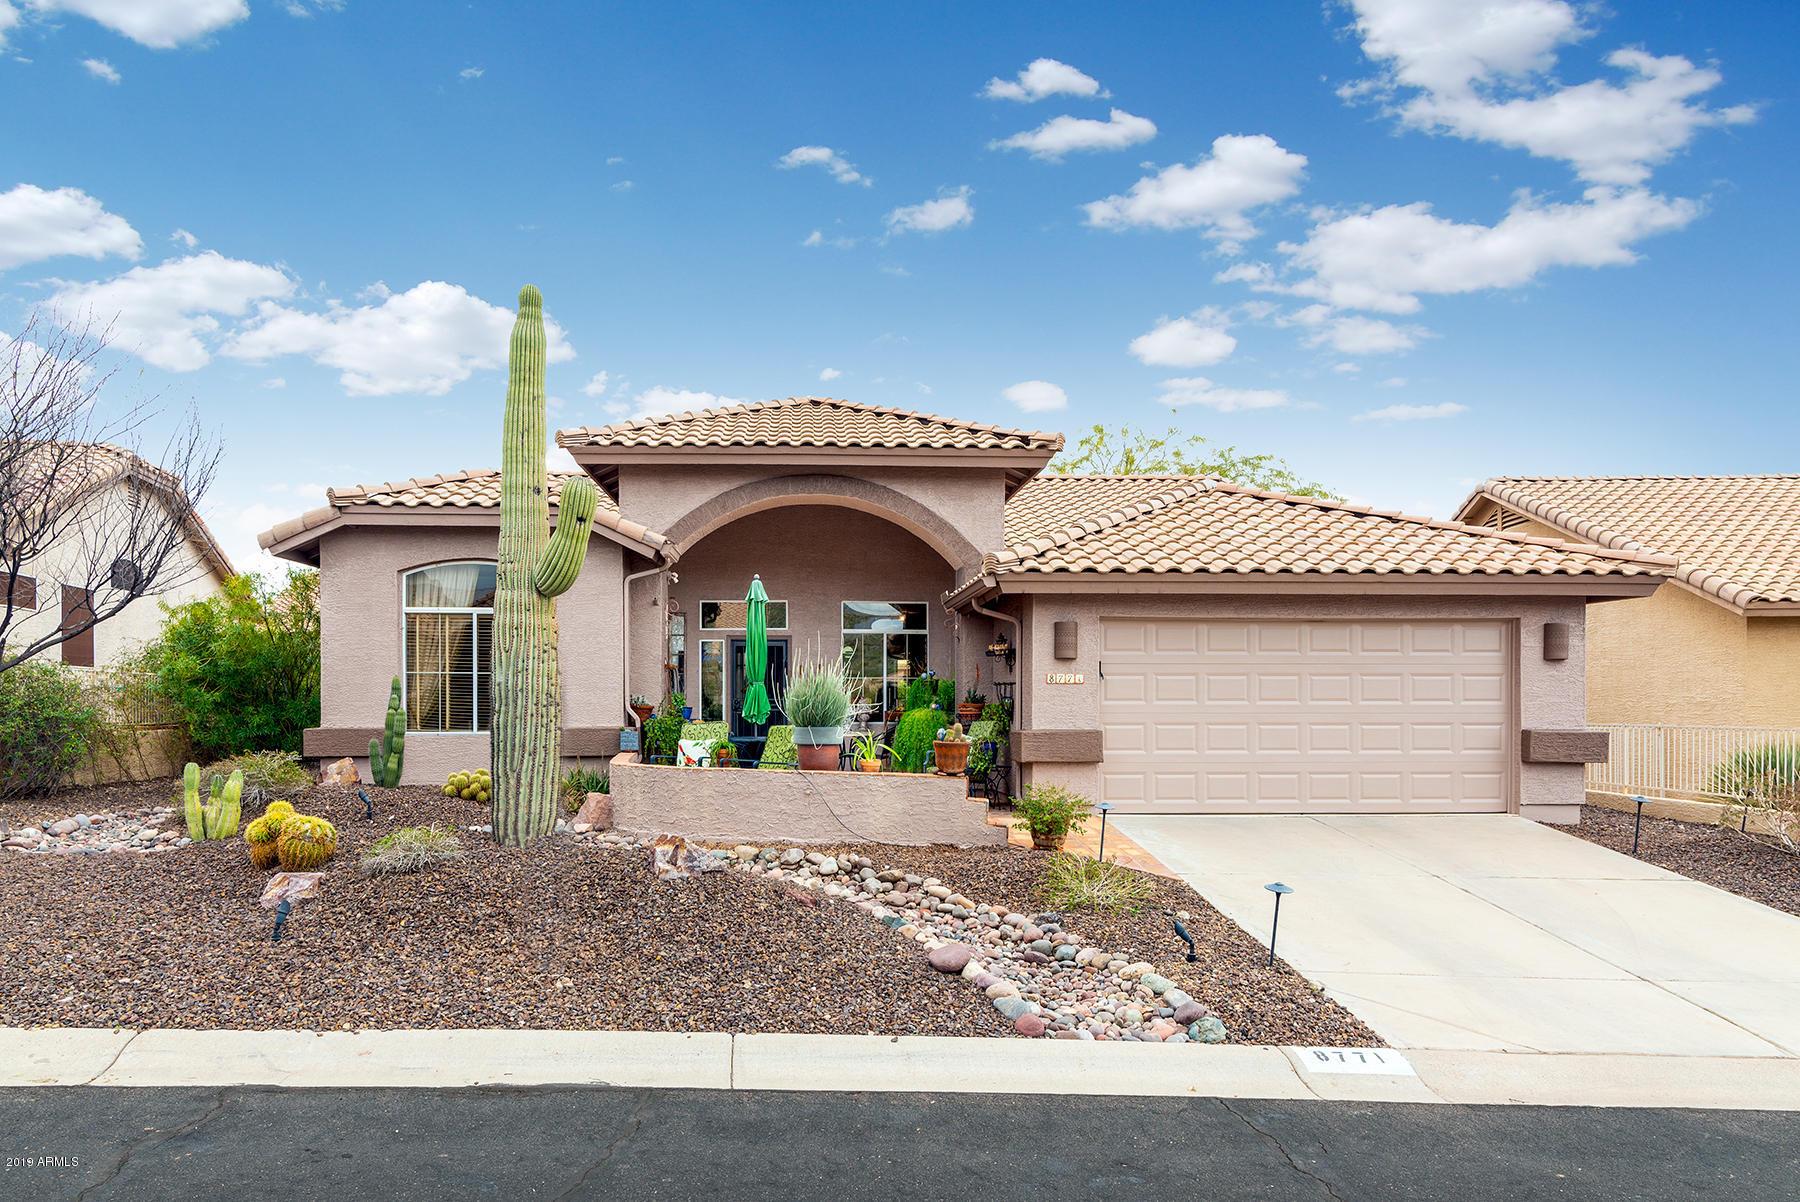 MLS 5894415 8771 E GOLDEN CHOLLA Drive, Gold Canyon, AZ 85118 Gold Canyon AZ Mountainbrook Village